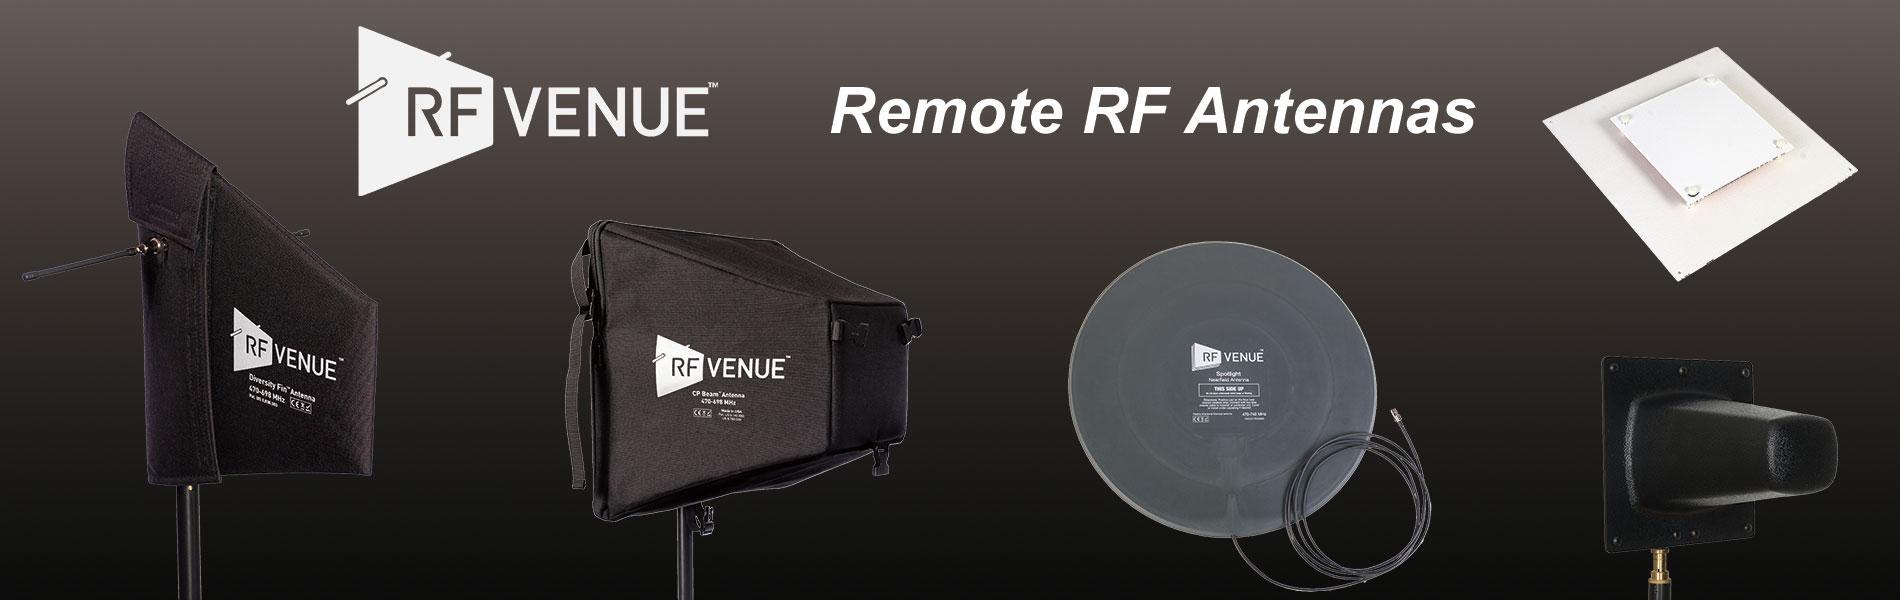 RFVアンテナ